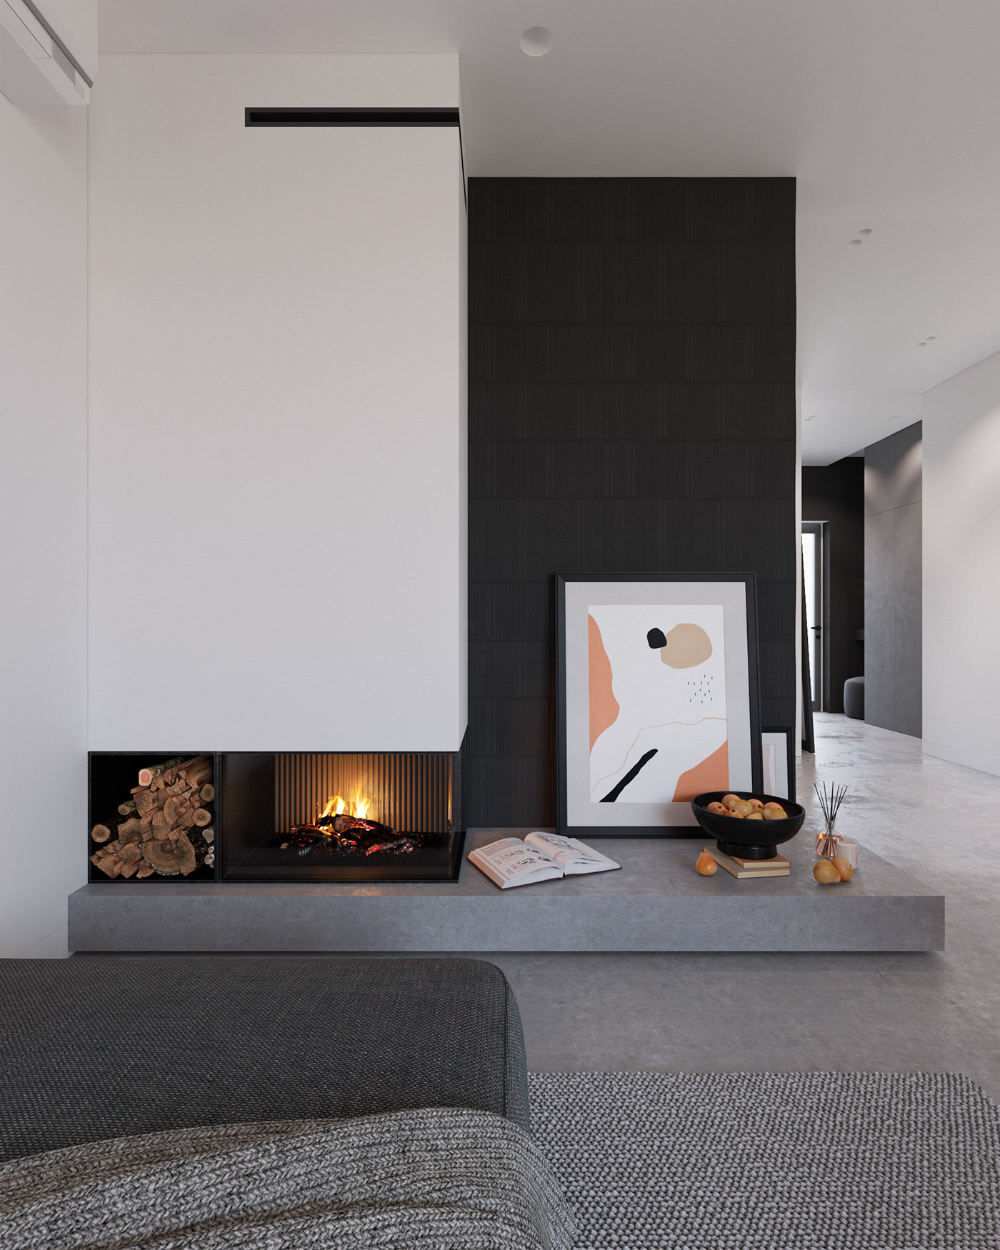 Autodesk Room Design: Pin On Interior & Space